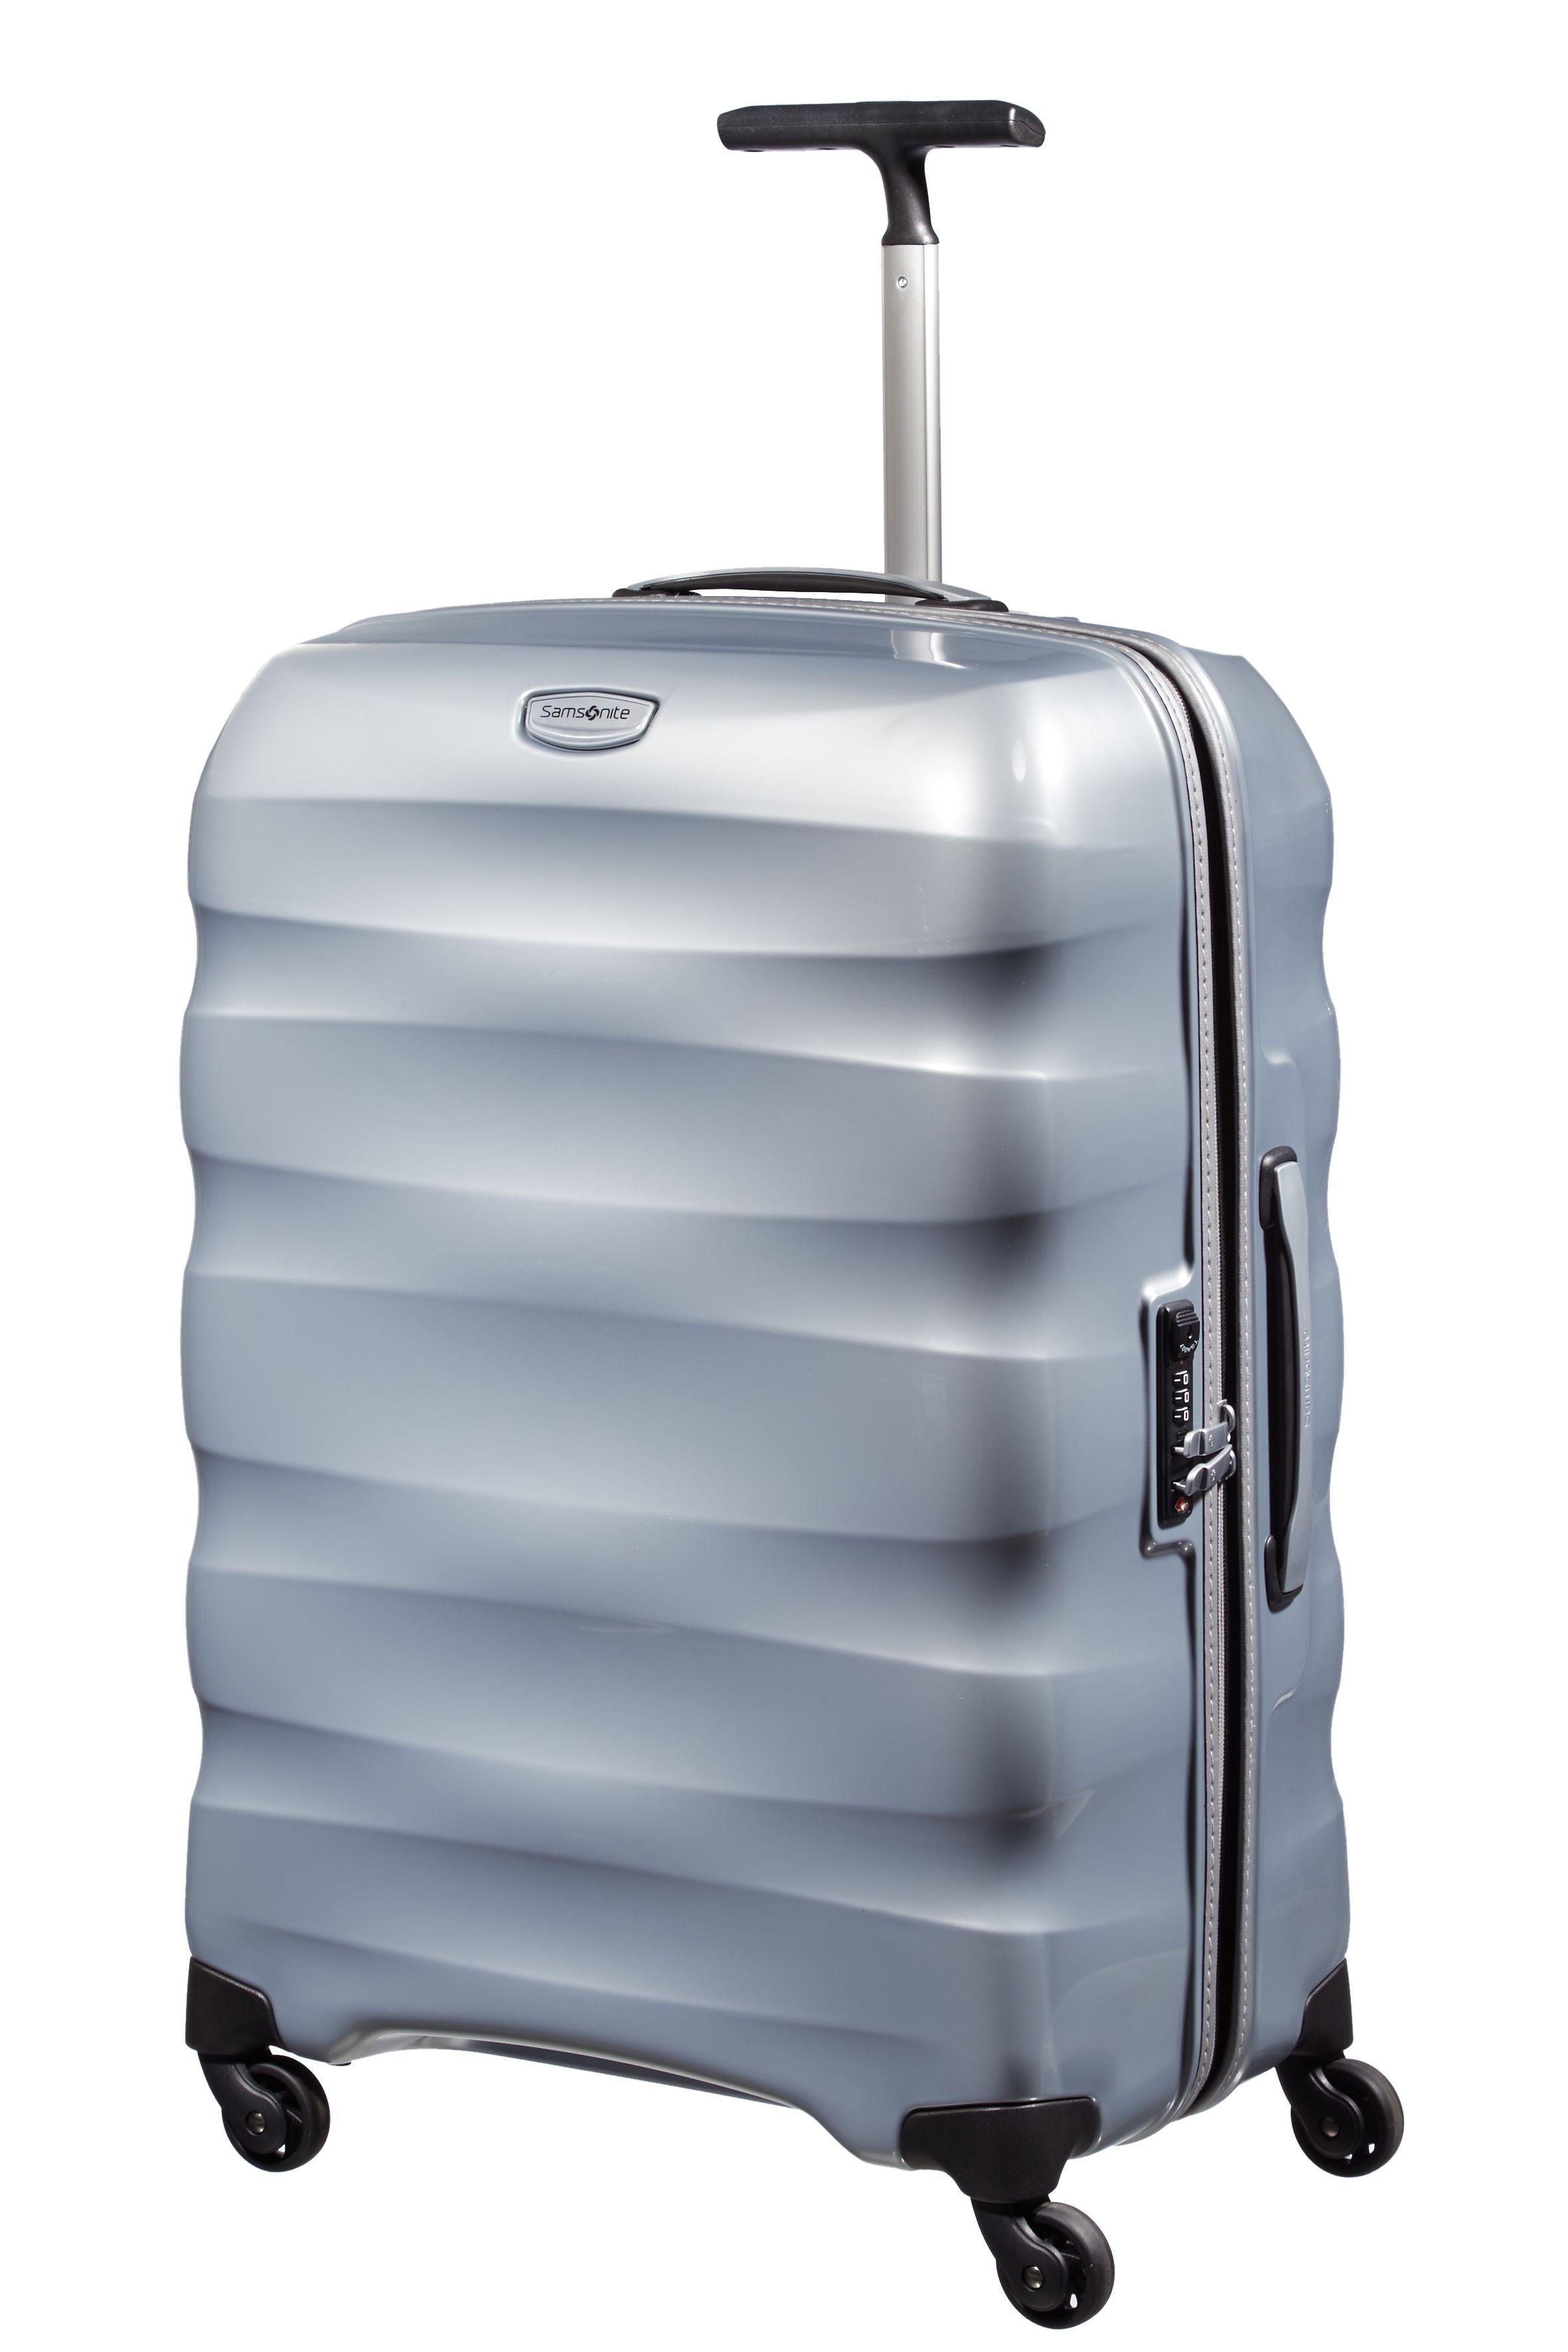 samsoniteCase Hard Cabin 4 Wheels Spinner Trolley Luggage Suitcase